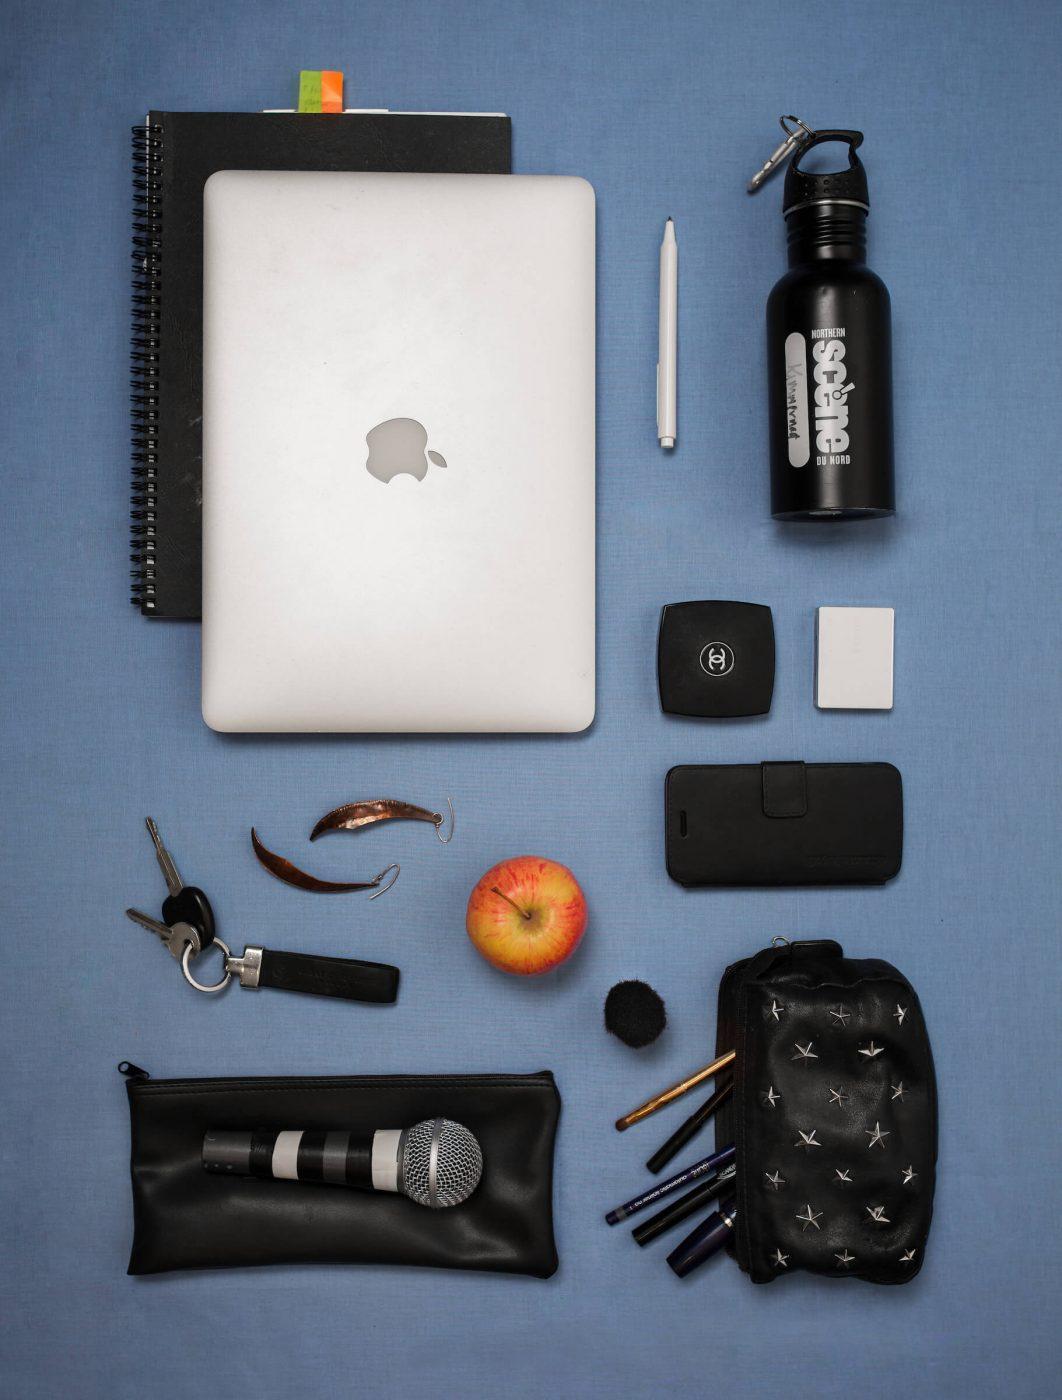 The everyday items of greenlandic actor and singer Kimmernaq Kjeldsen. Photo by Rebecca Gustafsson